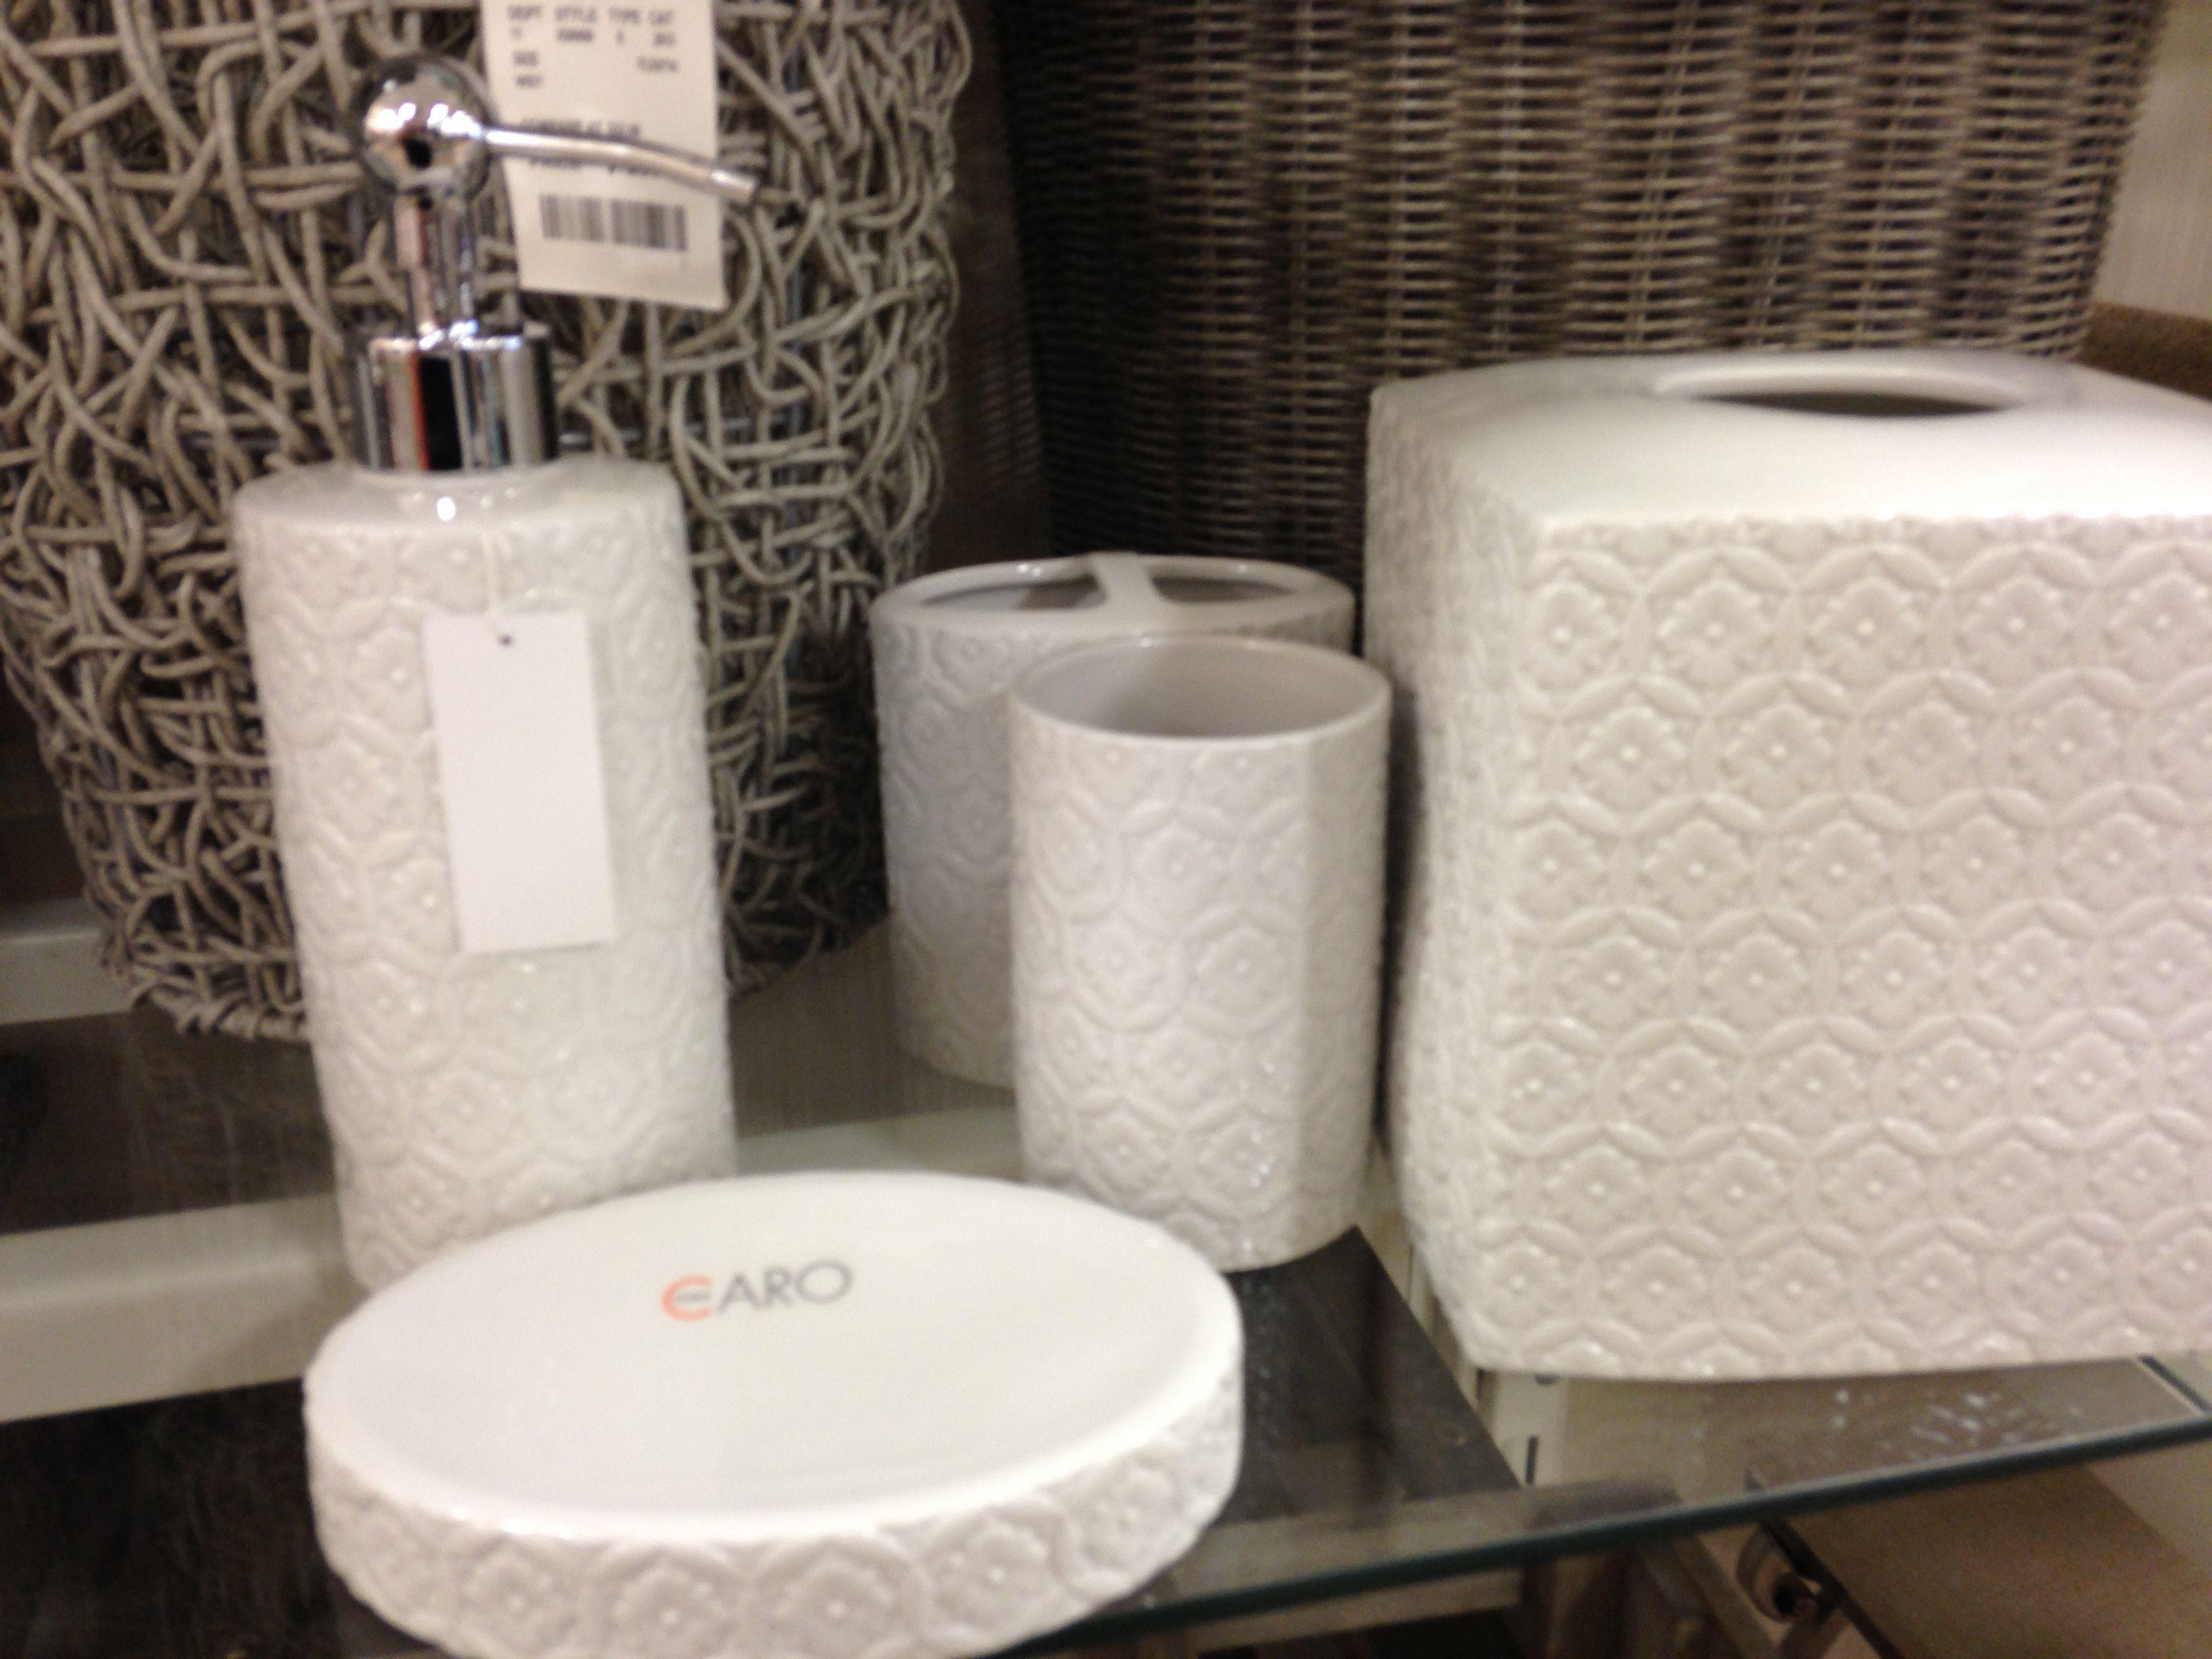 Bathroom accessories at Home Goods  Amazing bathrooms, Bathroom